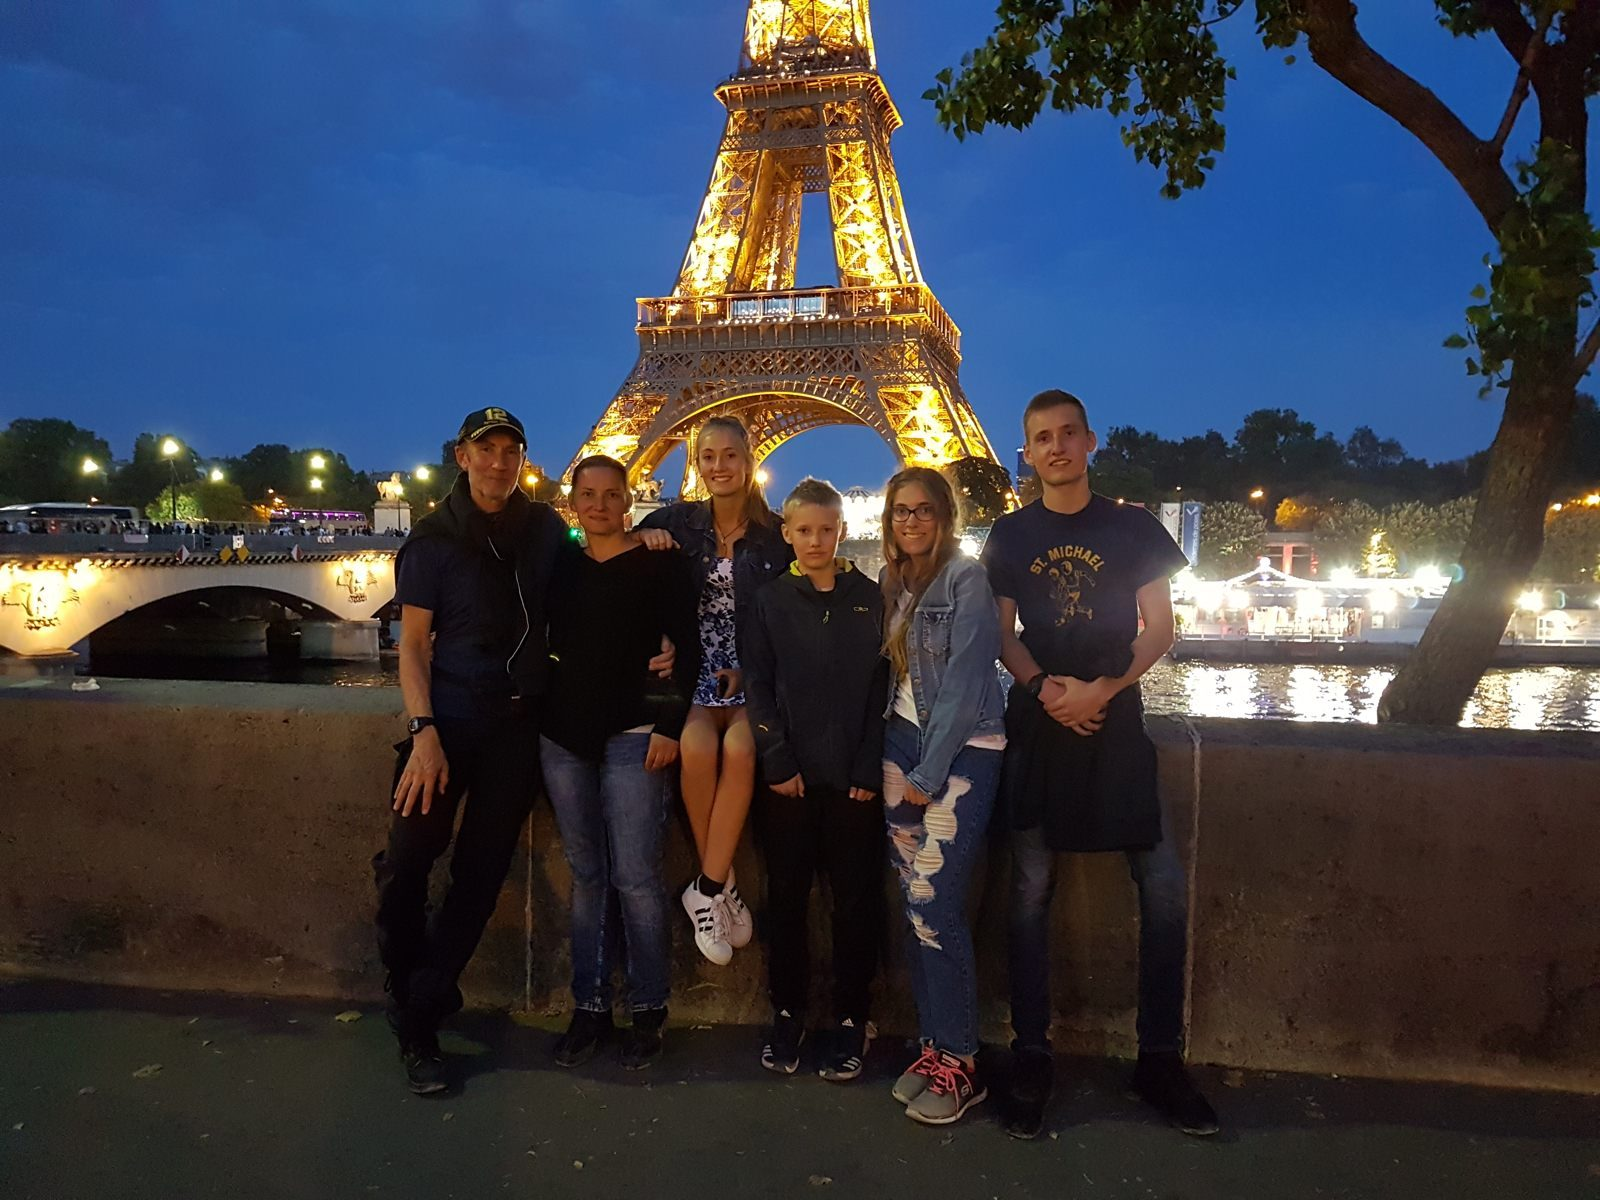 20190803 Eiffelturm